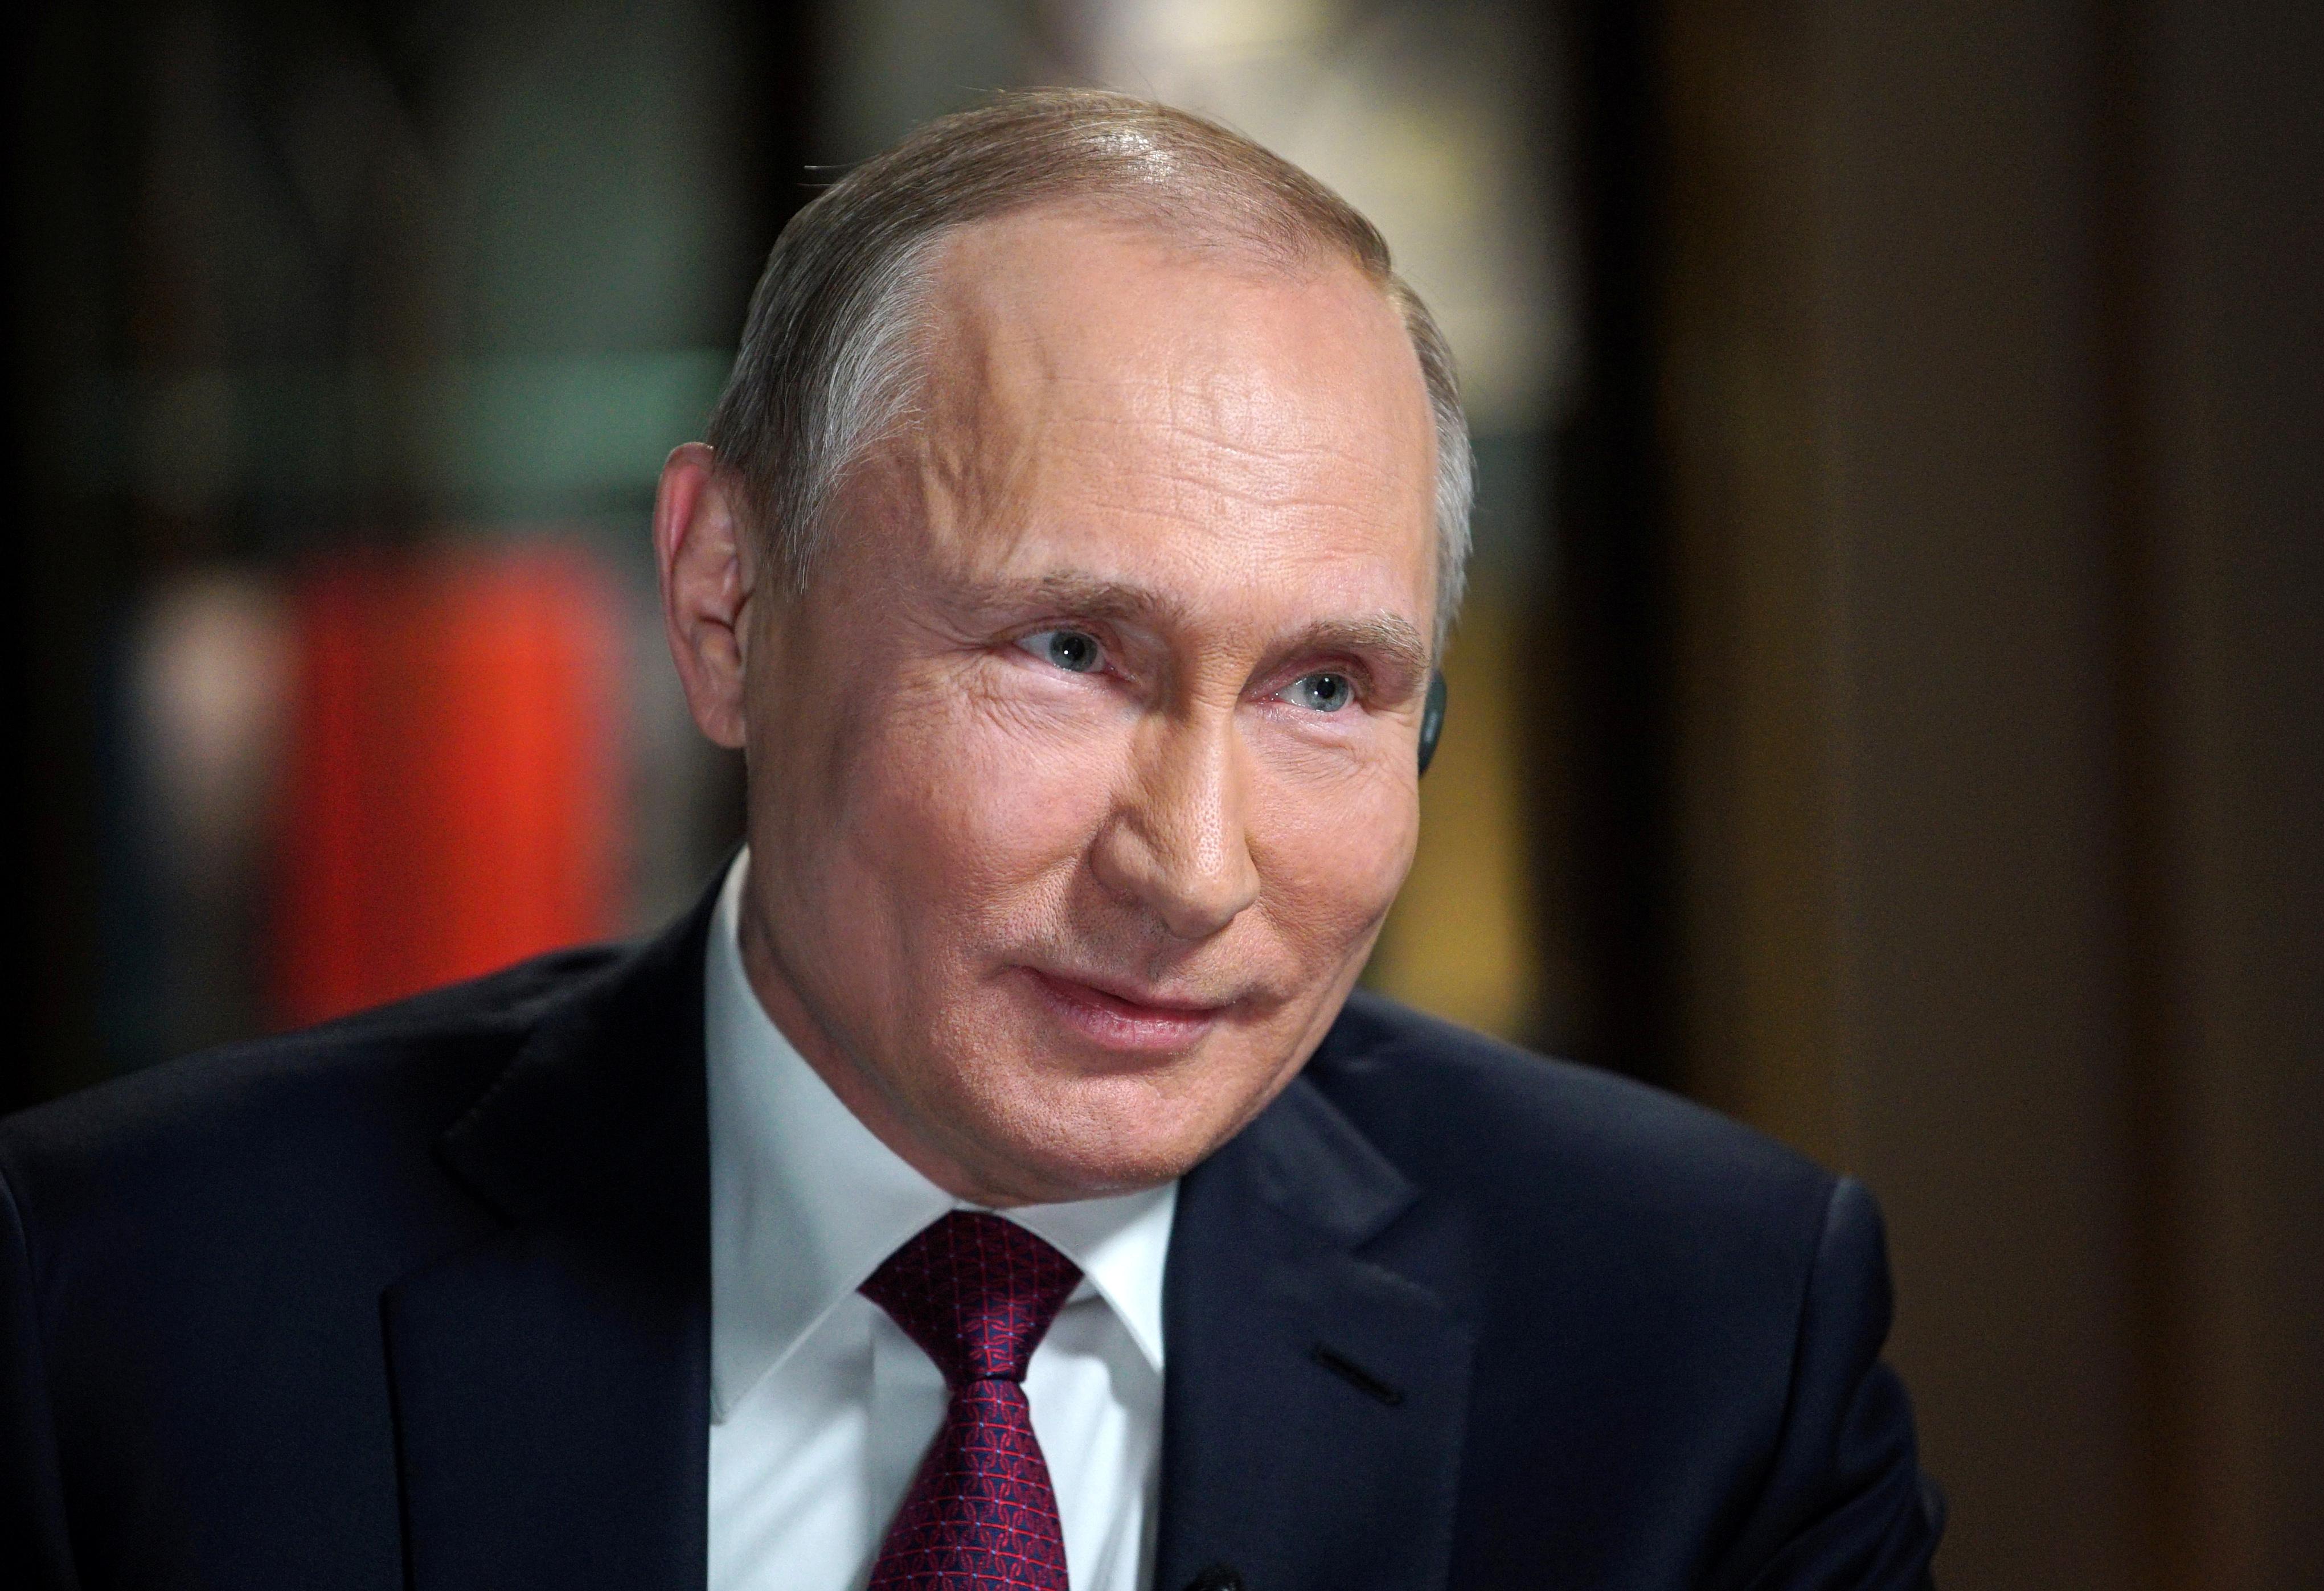 Vladimir-Putin-sprijin-electoral-pentru-socialiști